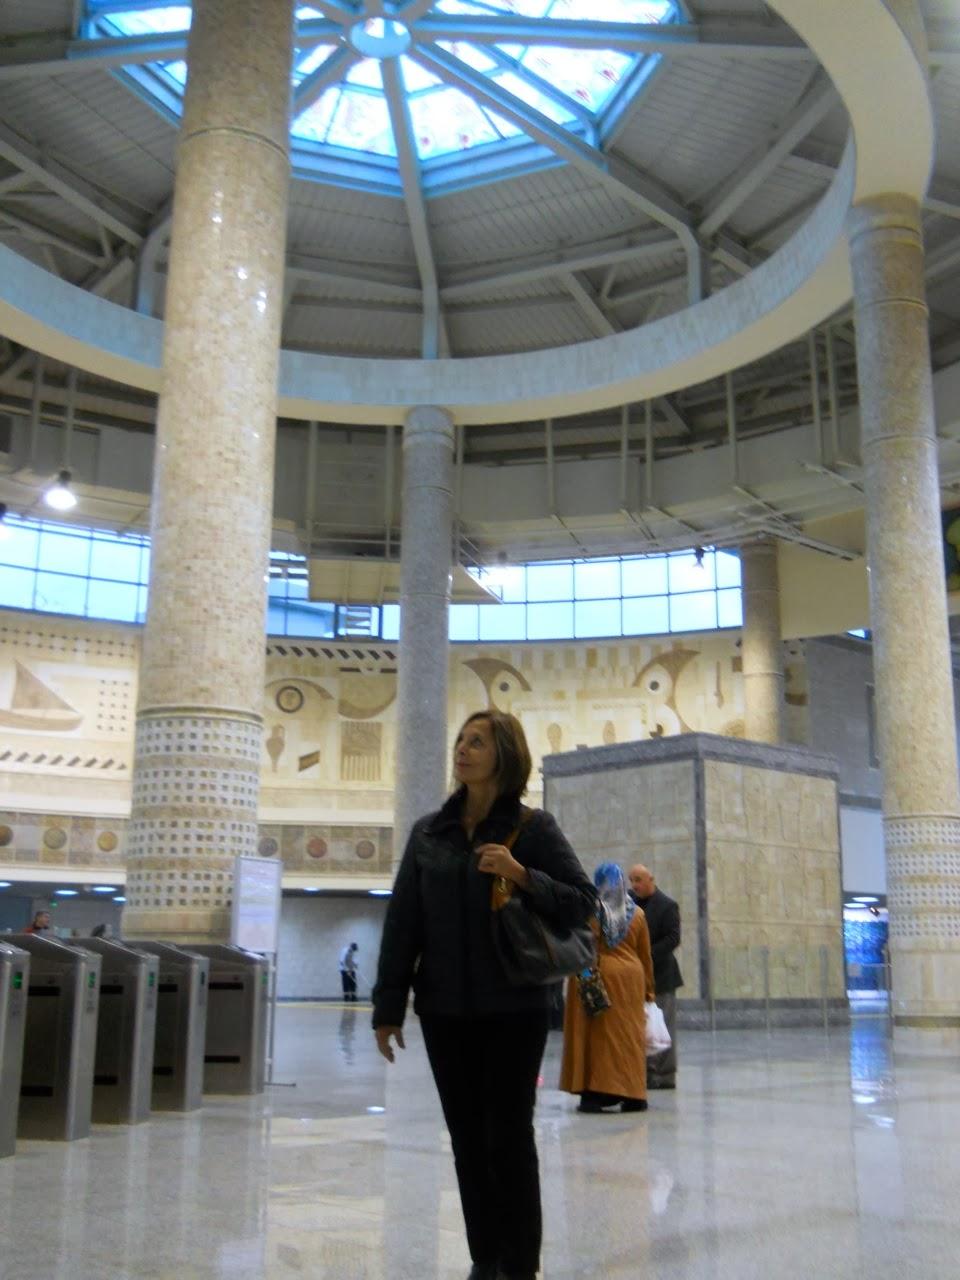 Yenikapı Metro Station